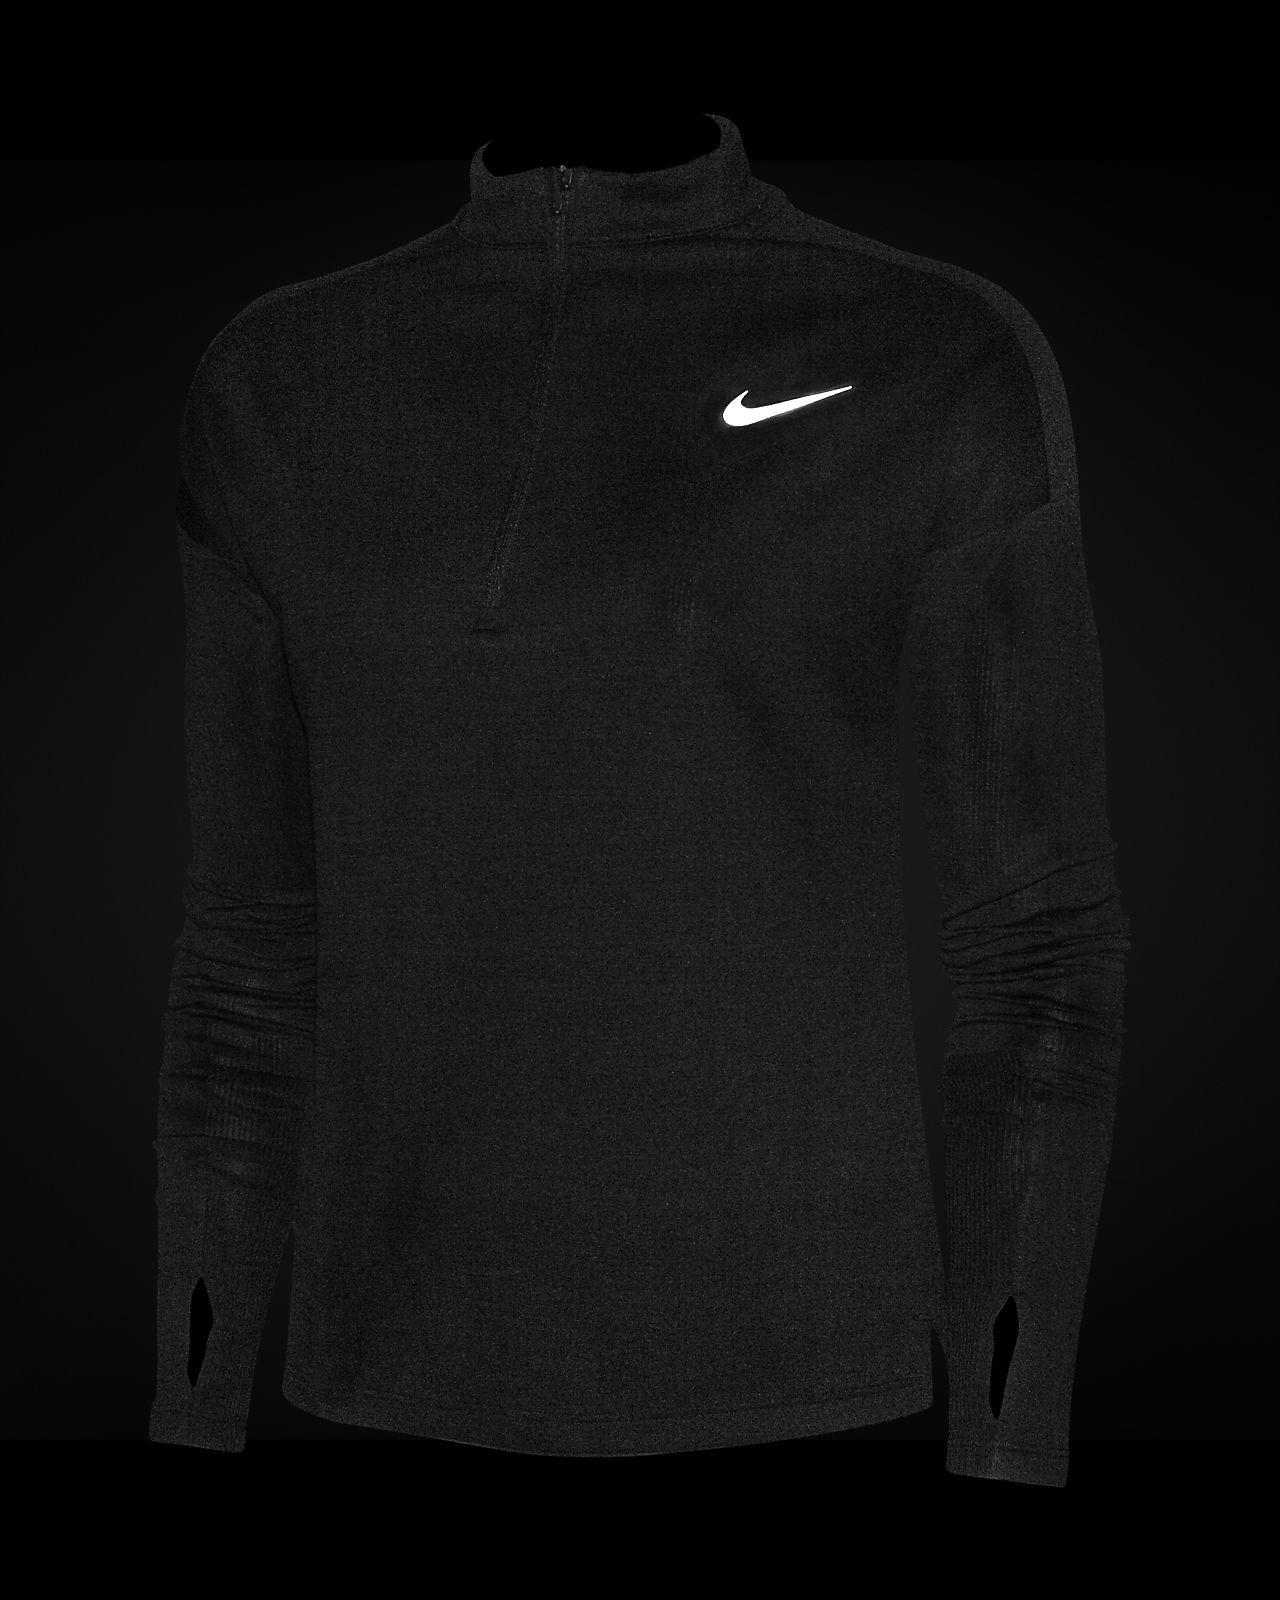 Nike Pacer De Con Running Media Camiseta Cremallera Mujer Yf6b7gy